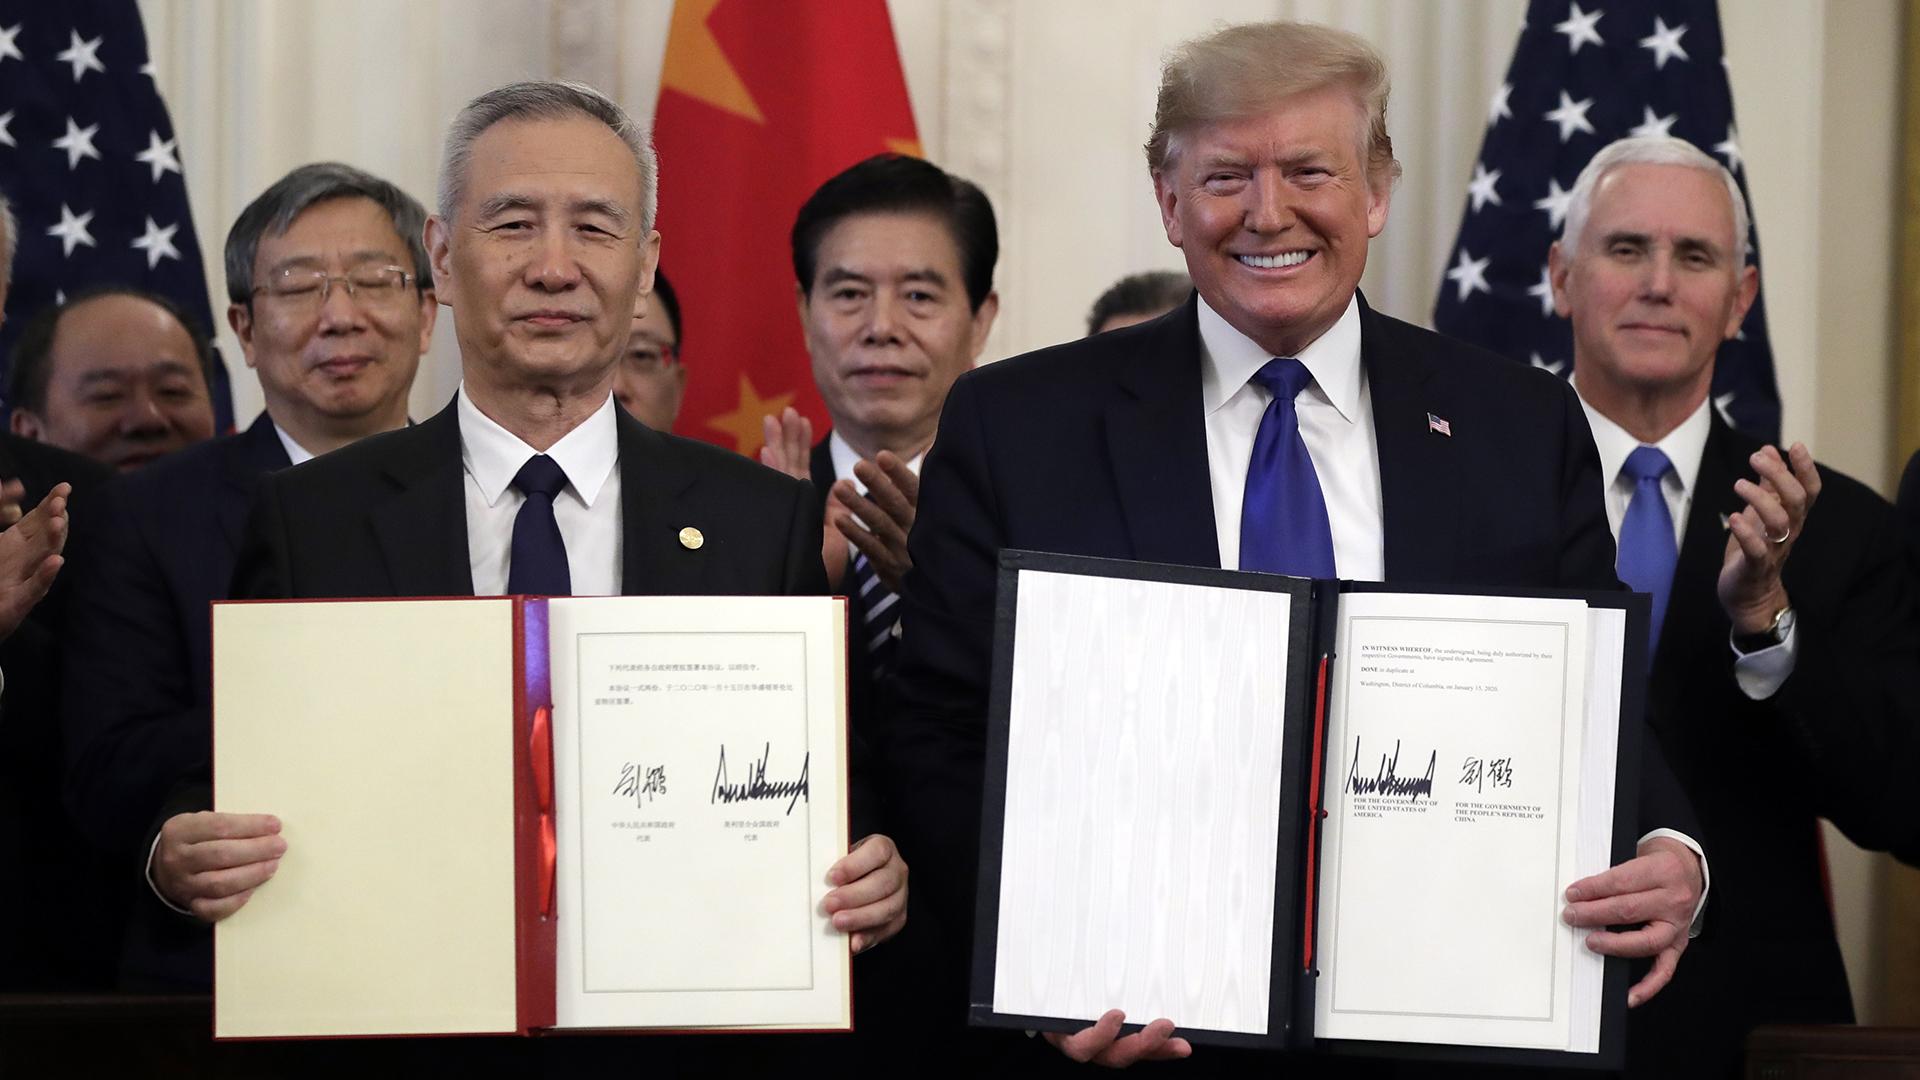 Trump celebra histórico pacto comercial con China